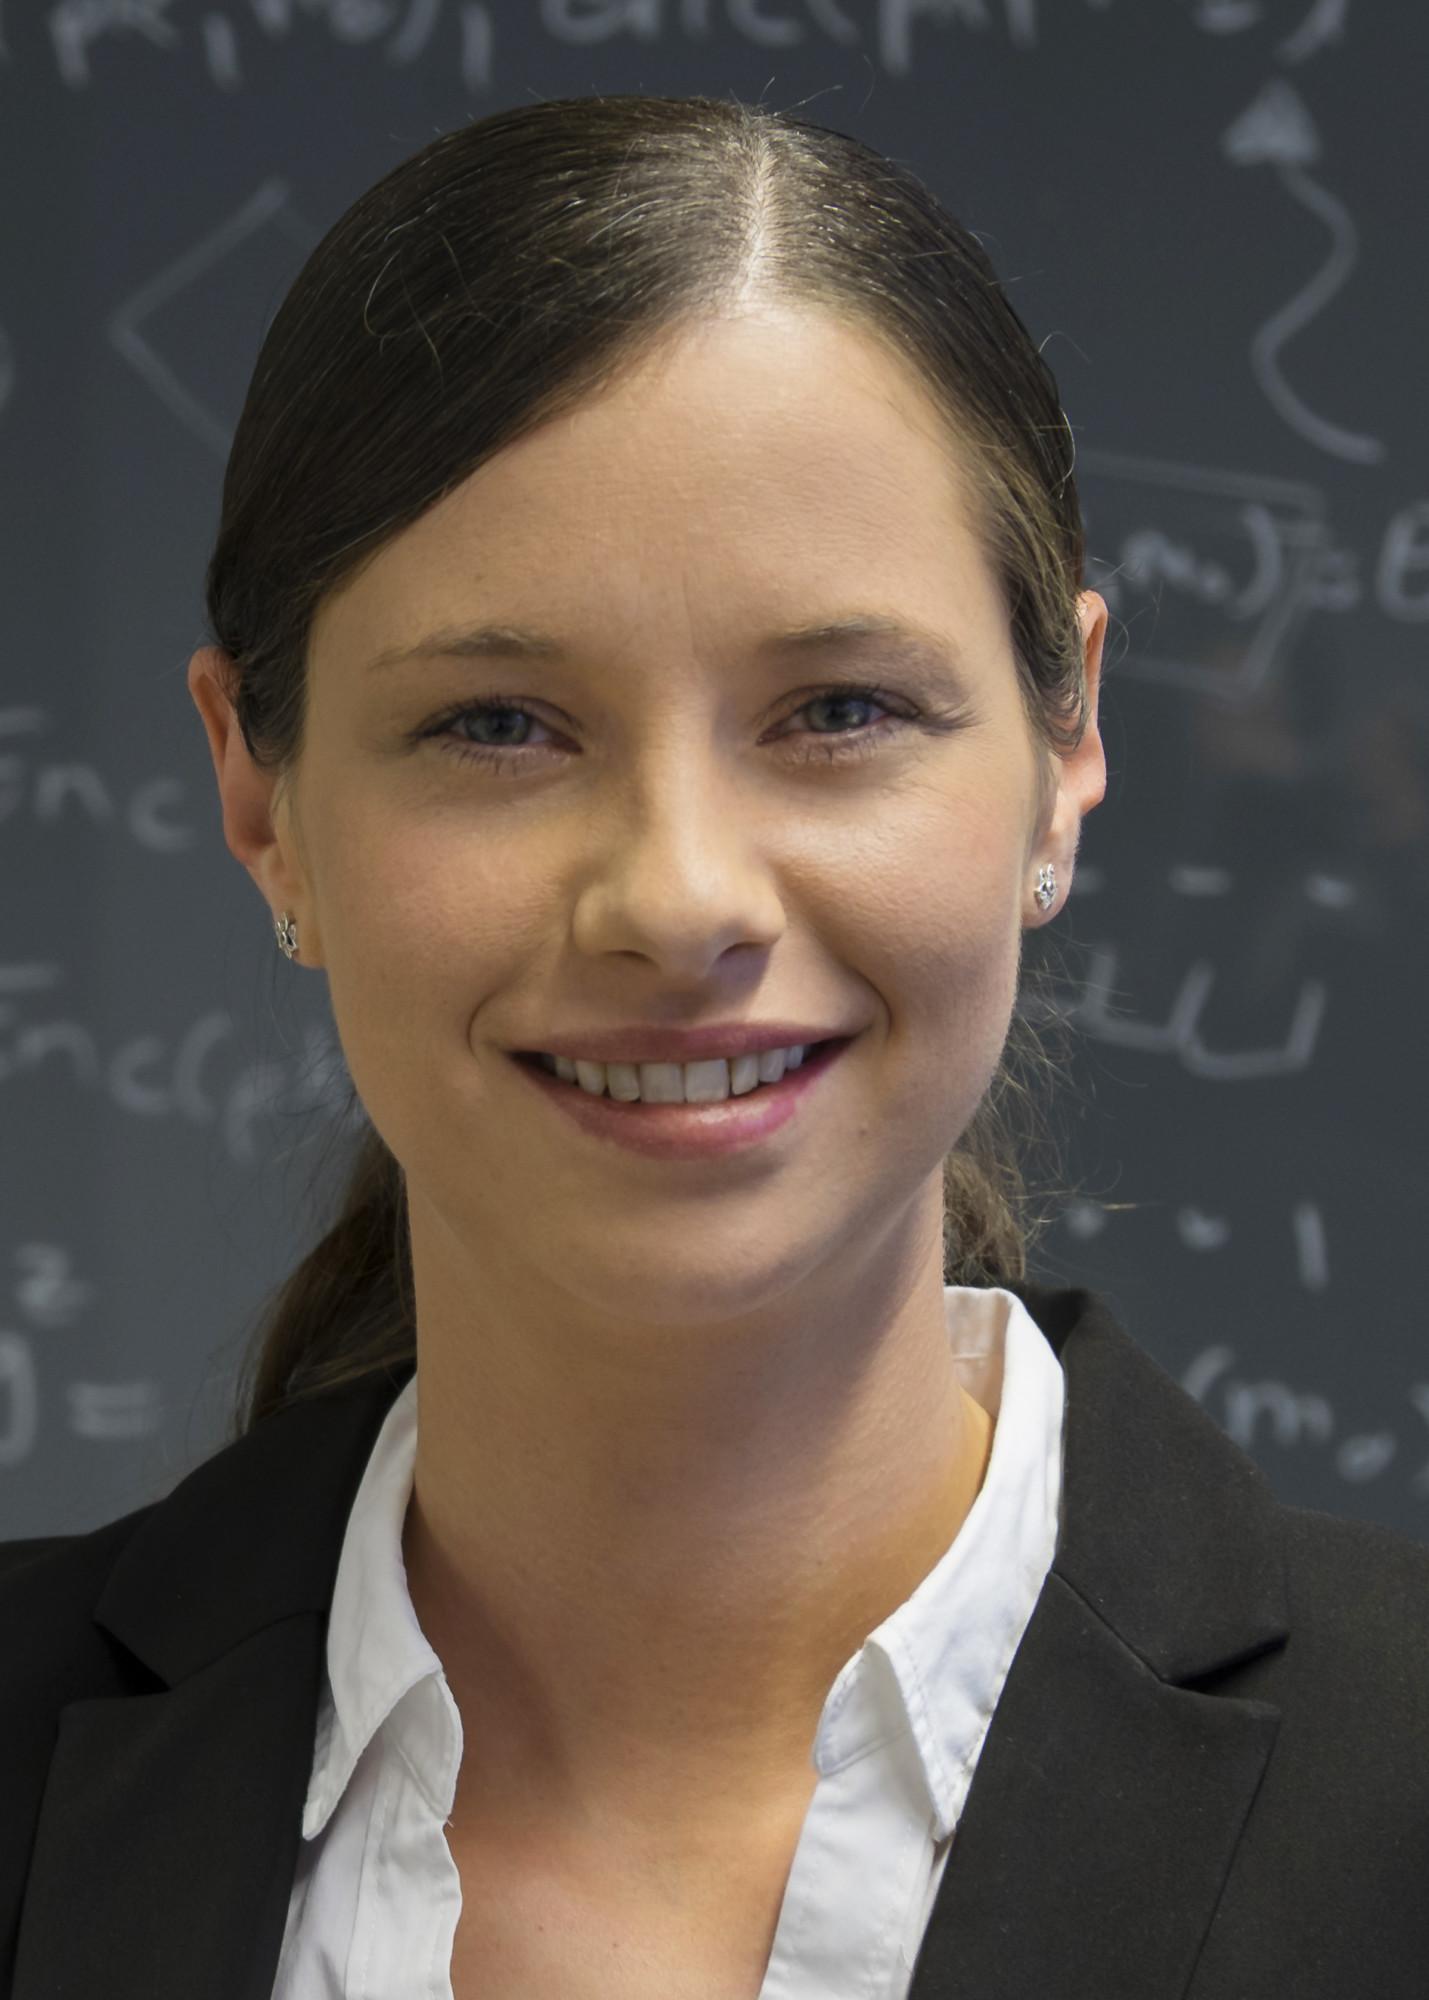 Yasmin Kleindienst-Heger